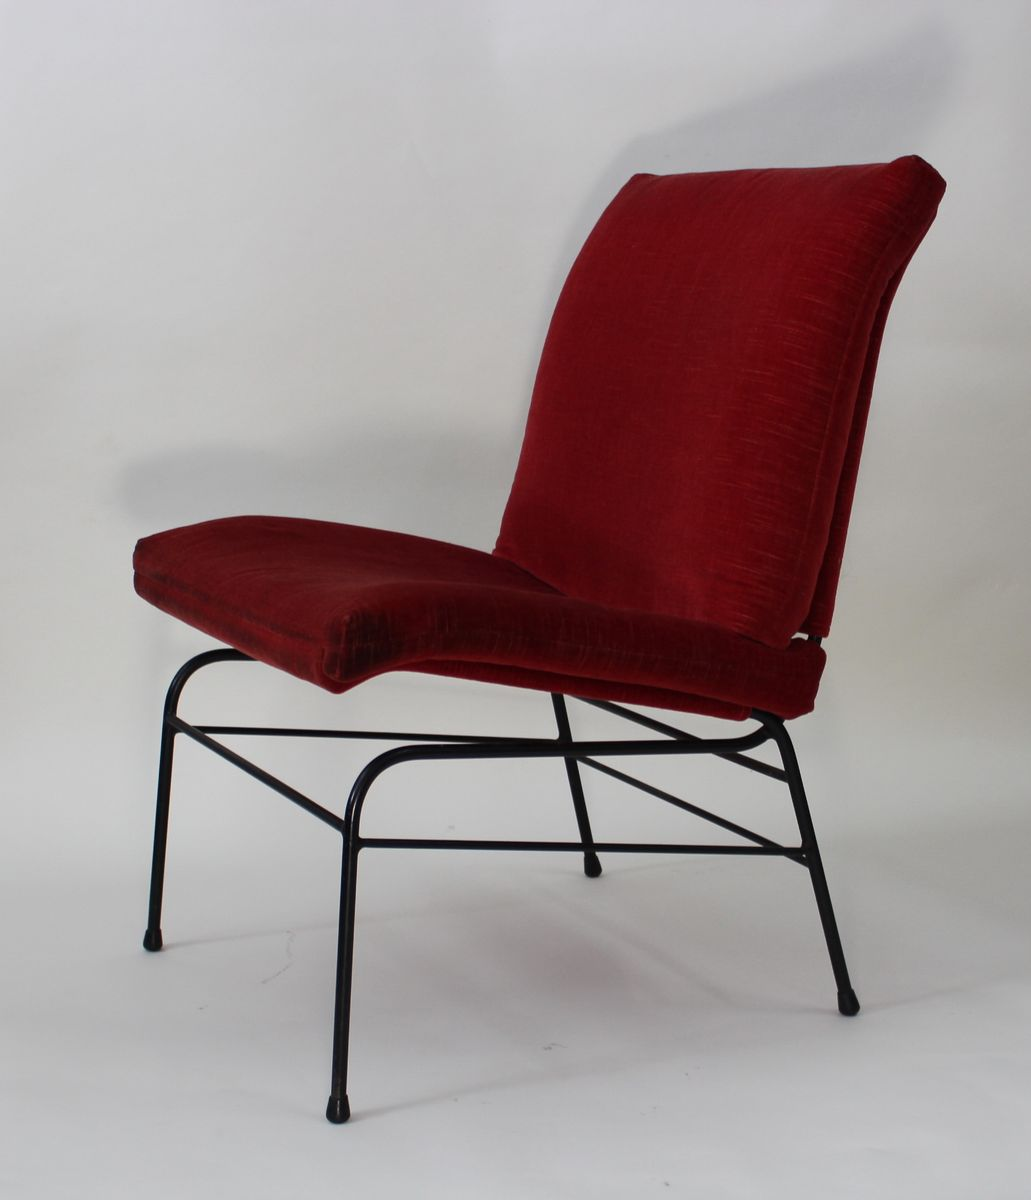 franz sische mid century mohair sessel 1950er 2er set bei pamono kaufen. Black Bedroom Furniture Sets. Home Design Ideas